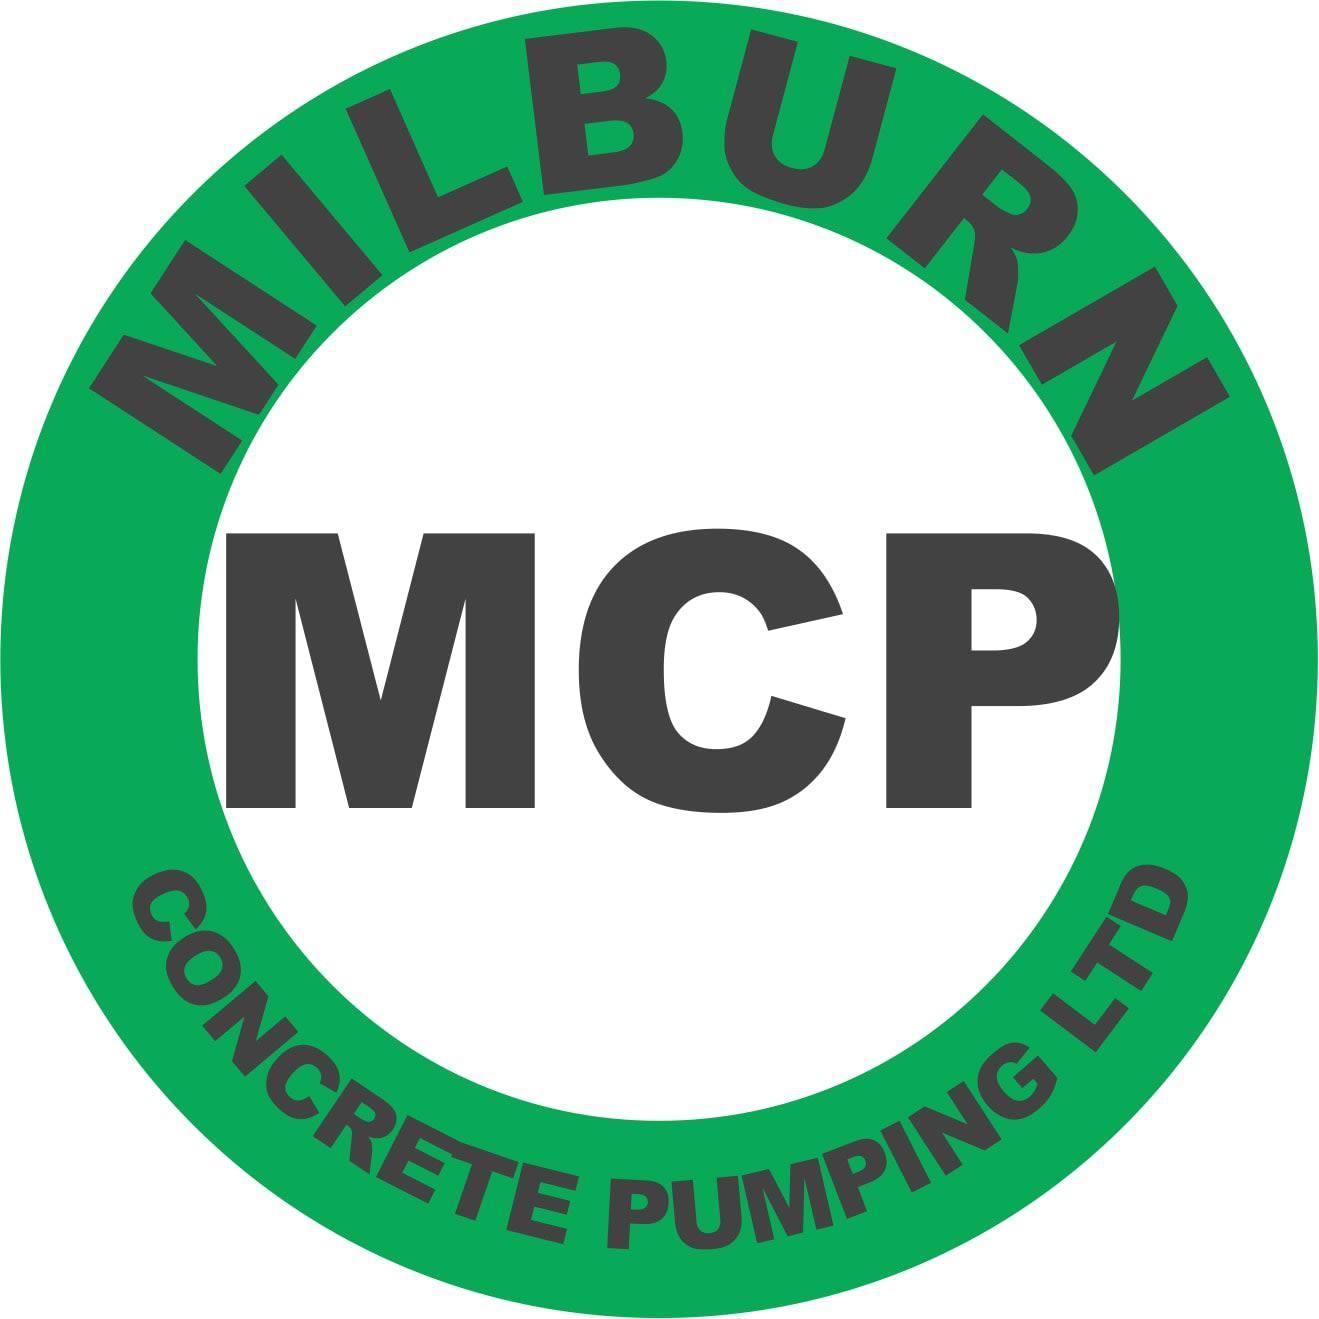 Milburn Concrete Pumping Ltd - Beverley, West Yorkshire HU17 0FD - 07961 845256 | ShowMeLocal.com